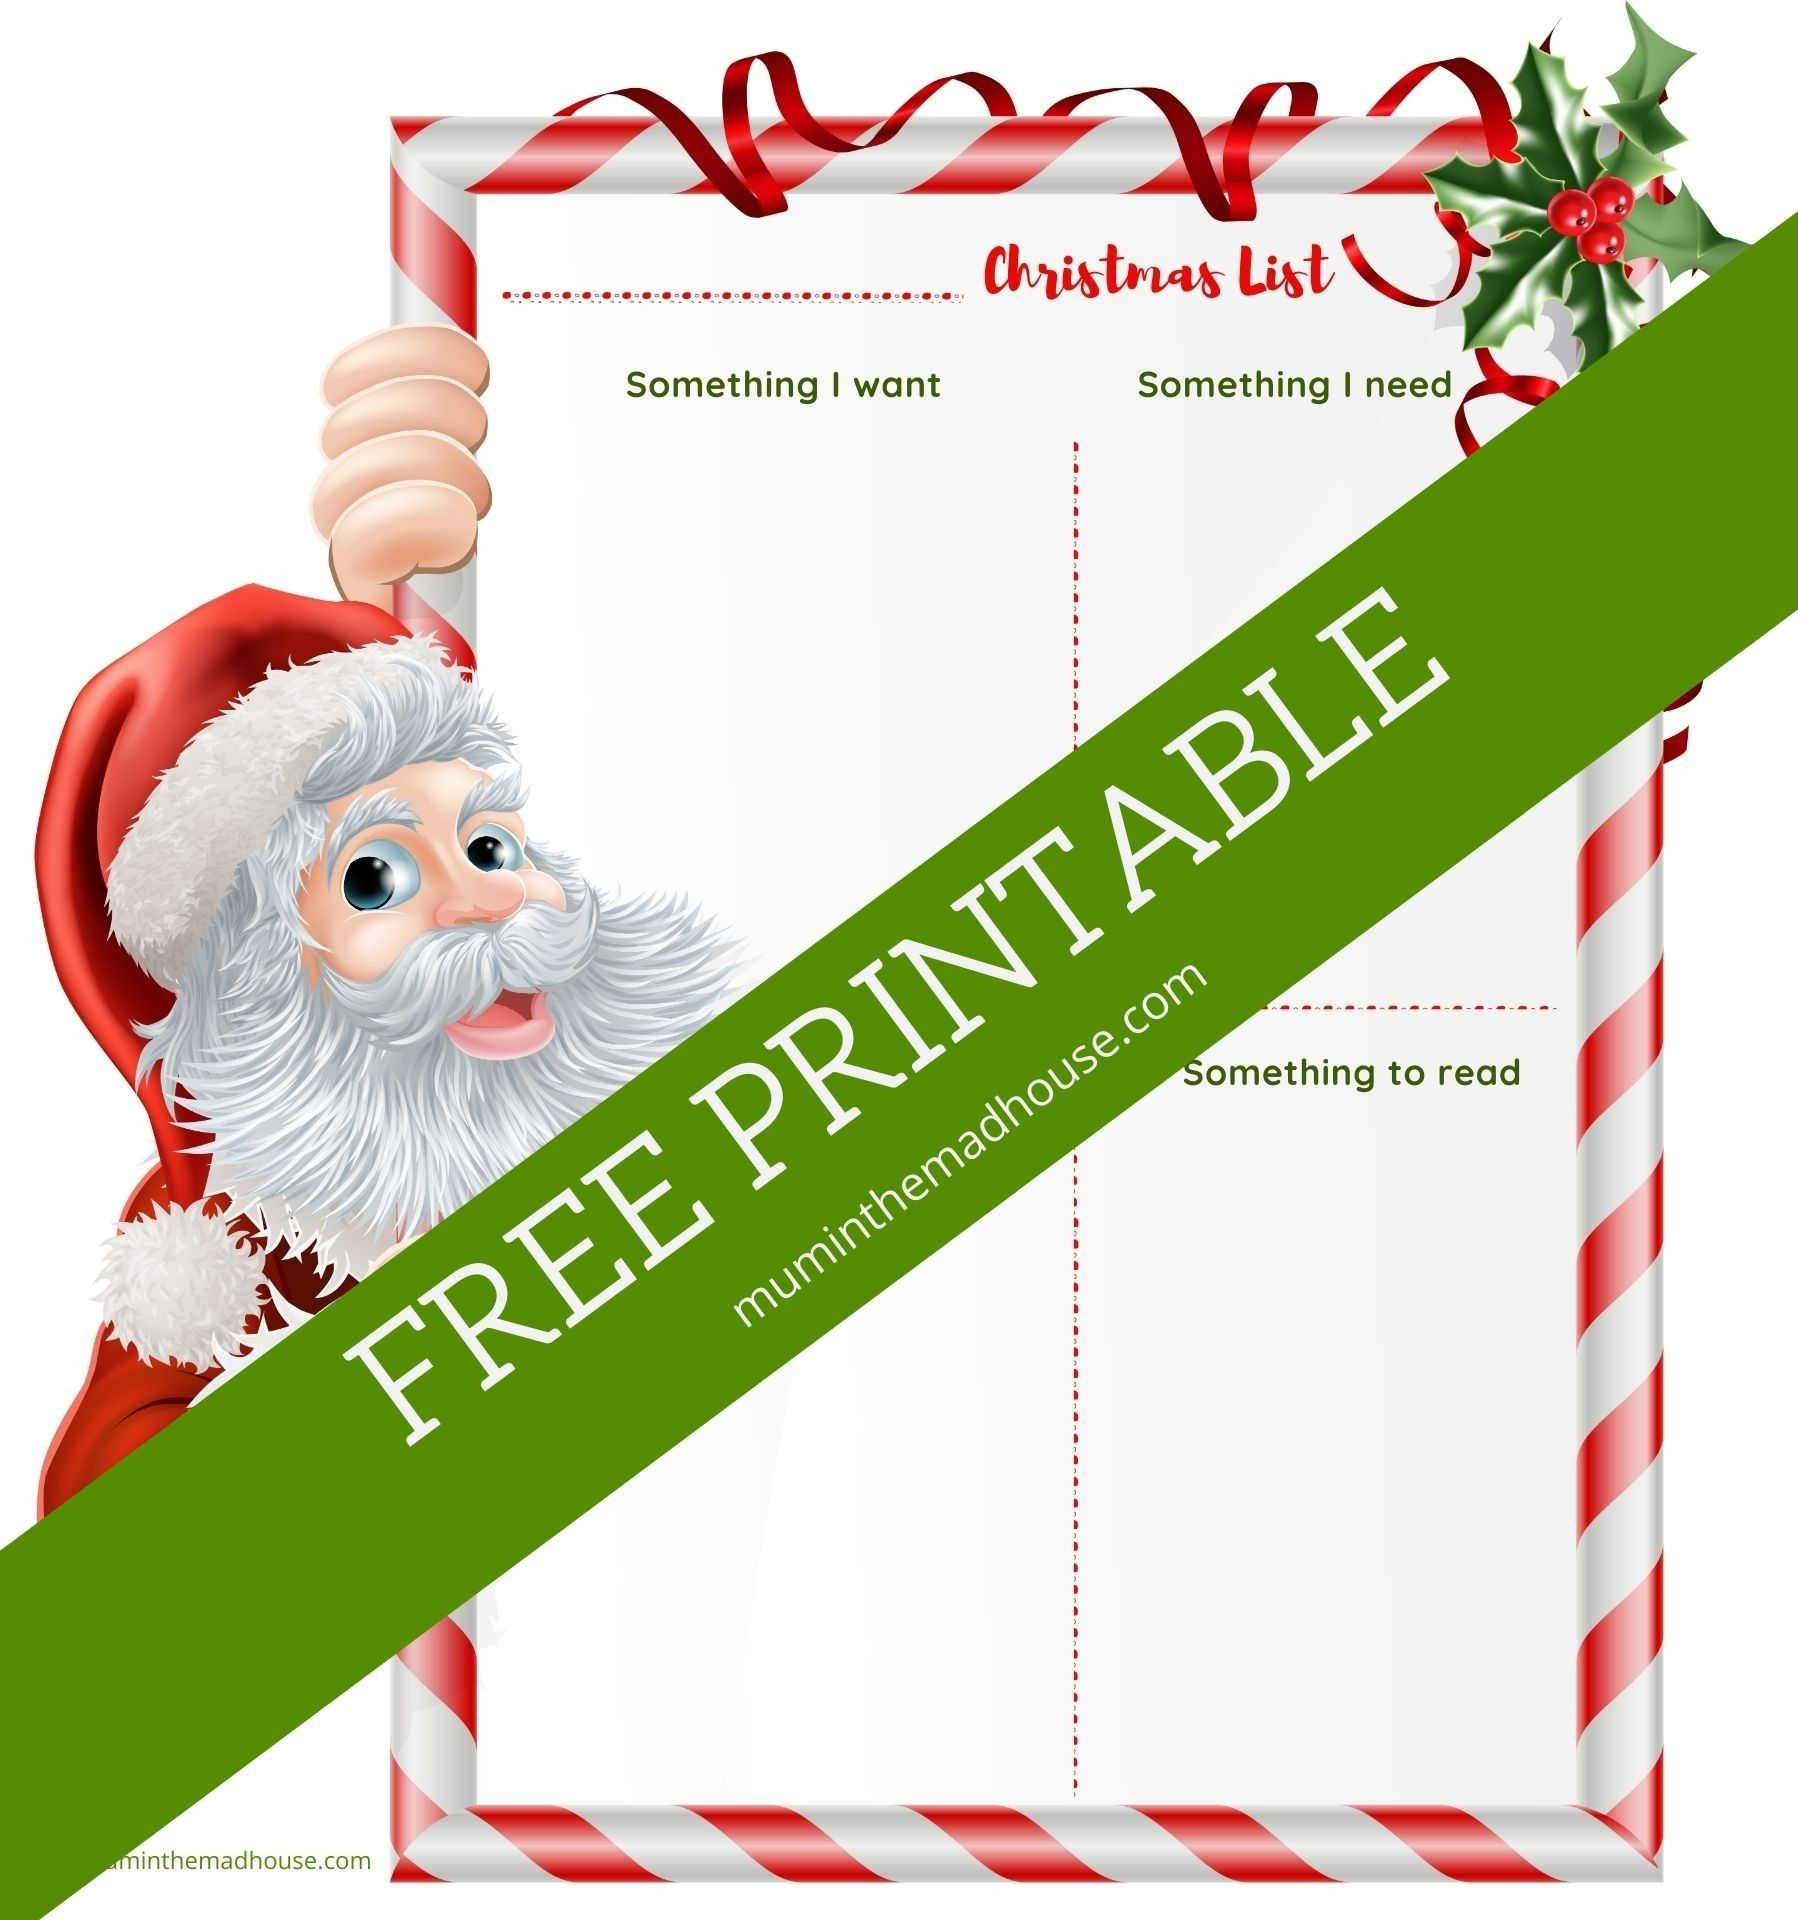 Free Printable Christmas Wish List In 2020 Free Christmas Printables Christmas Printables Christmas Wishlist